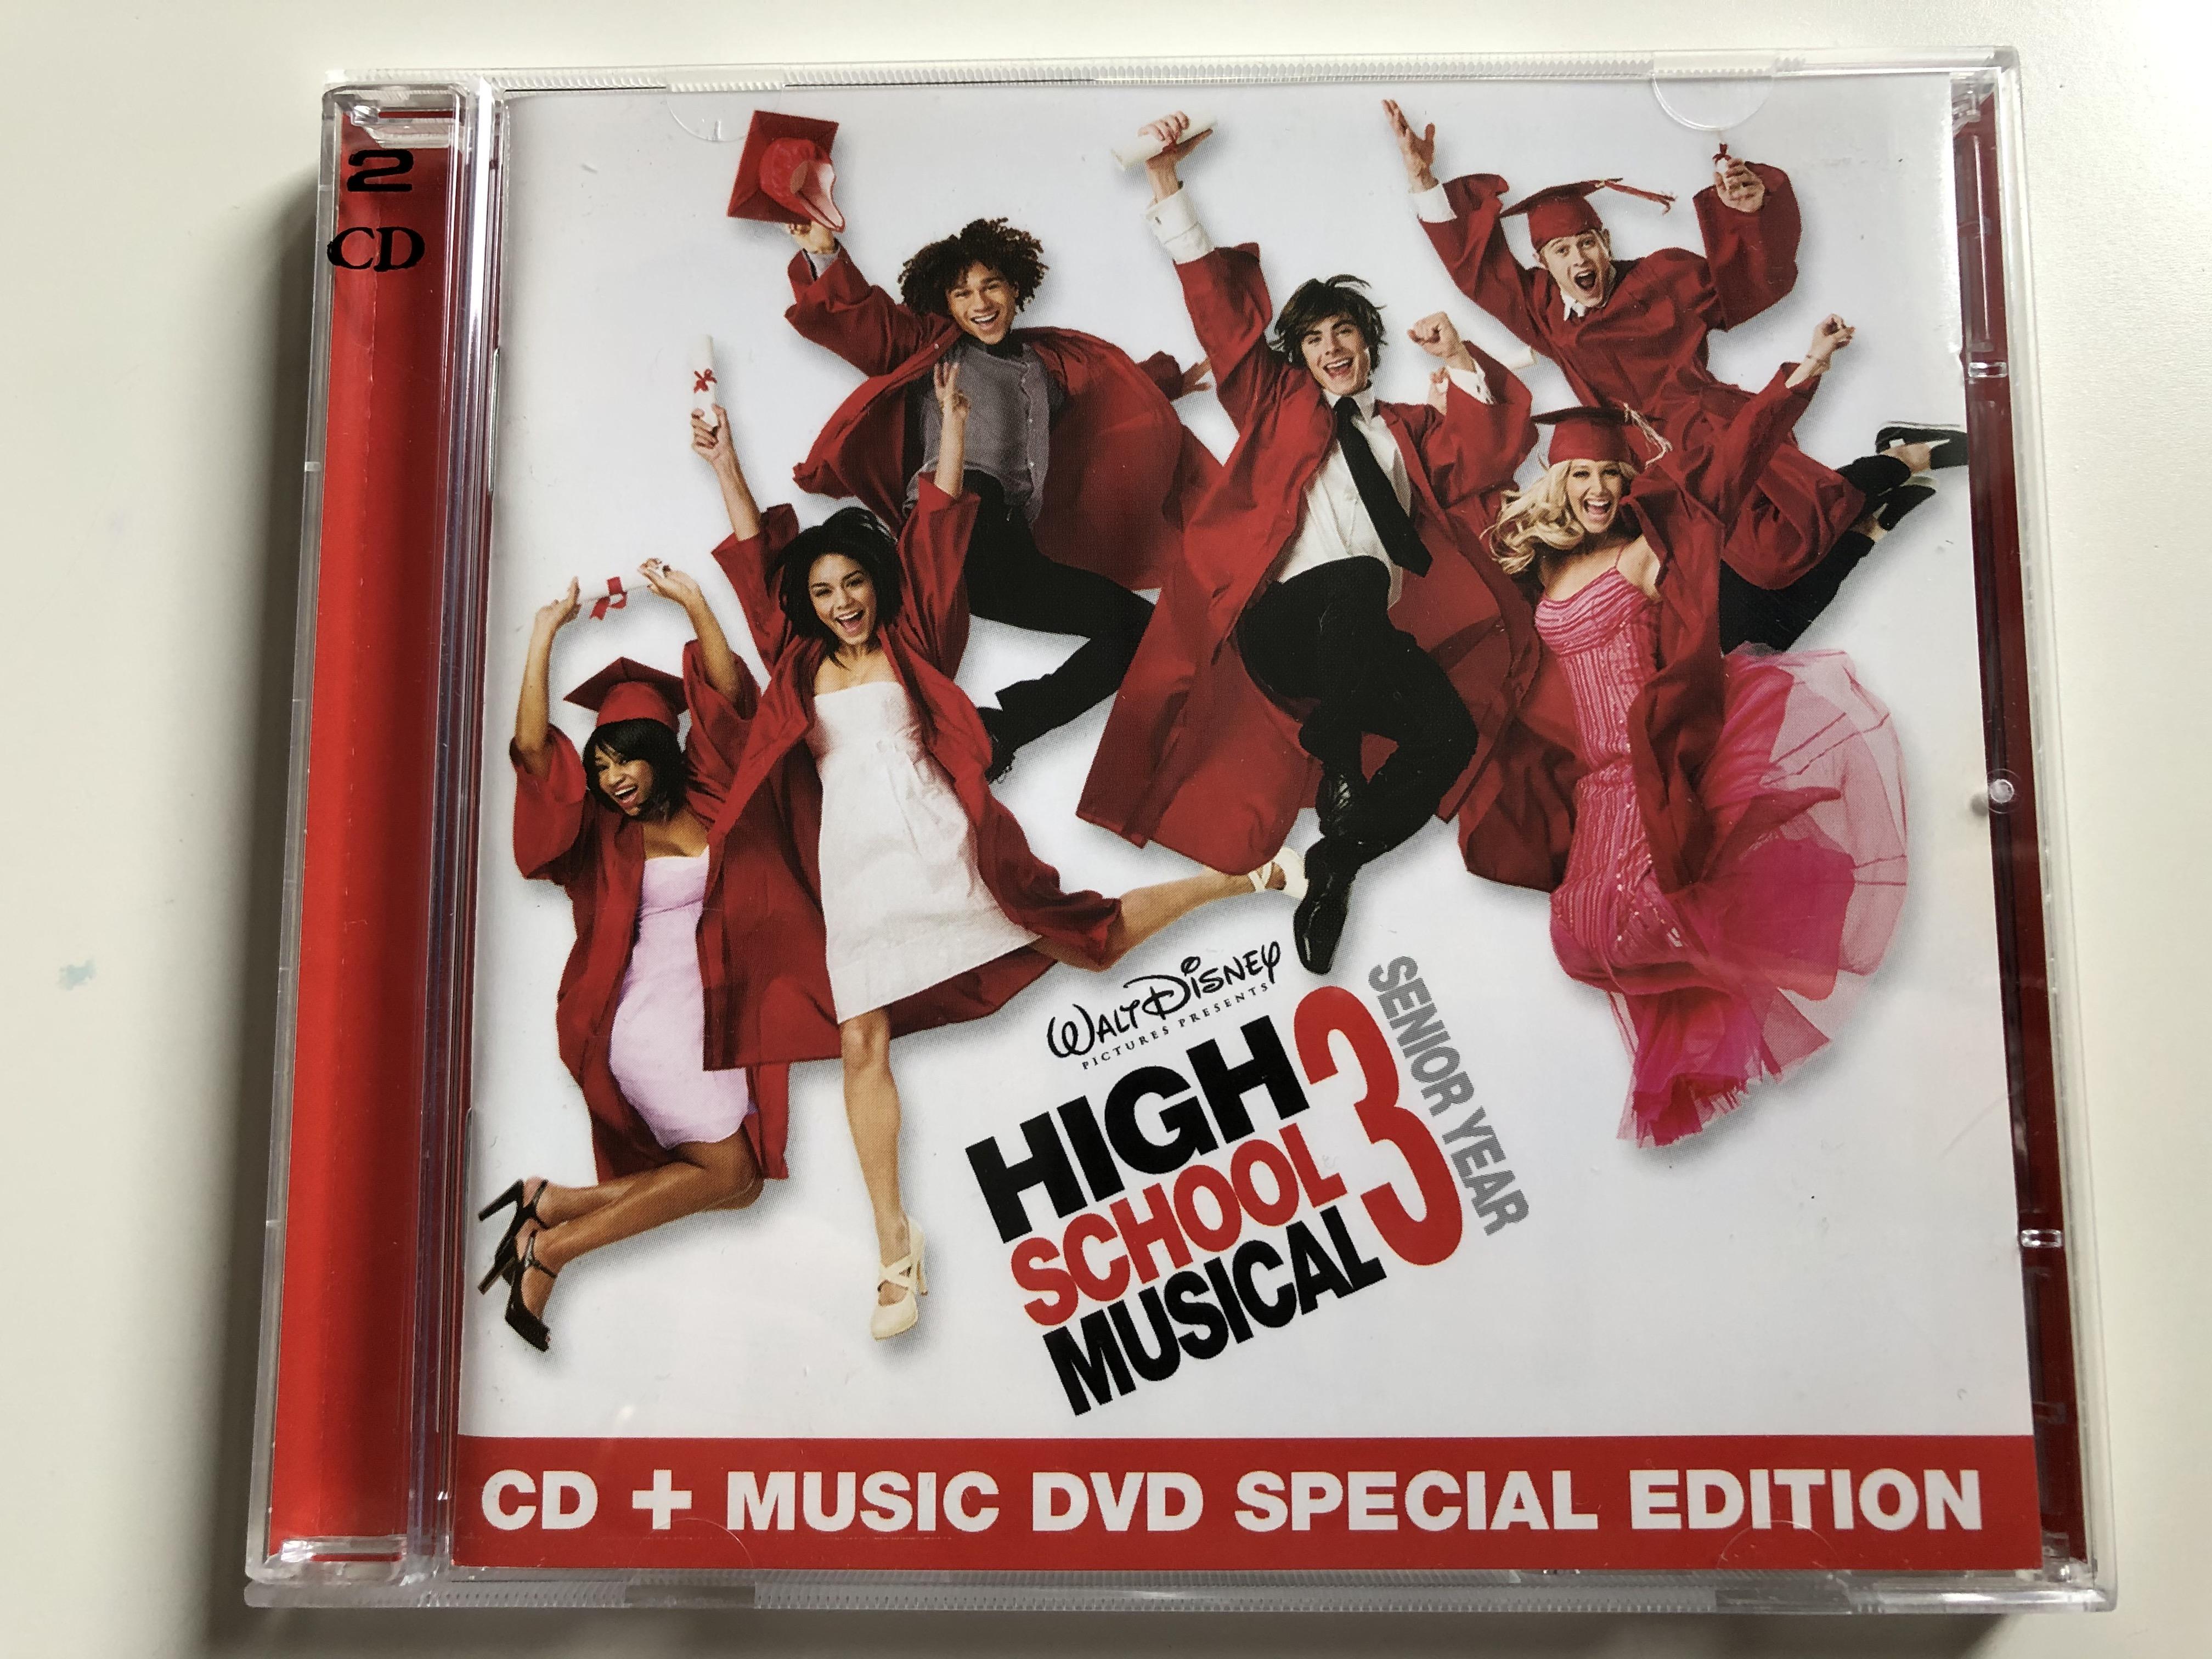 high-school-musical-3-senior-year-walt-disney-records-audio-cd-dvd-cd-special-edition-2008-5099923697829-1-.jpg